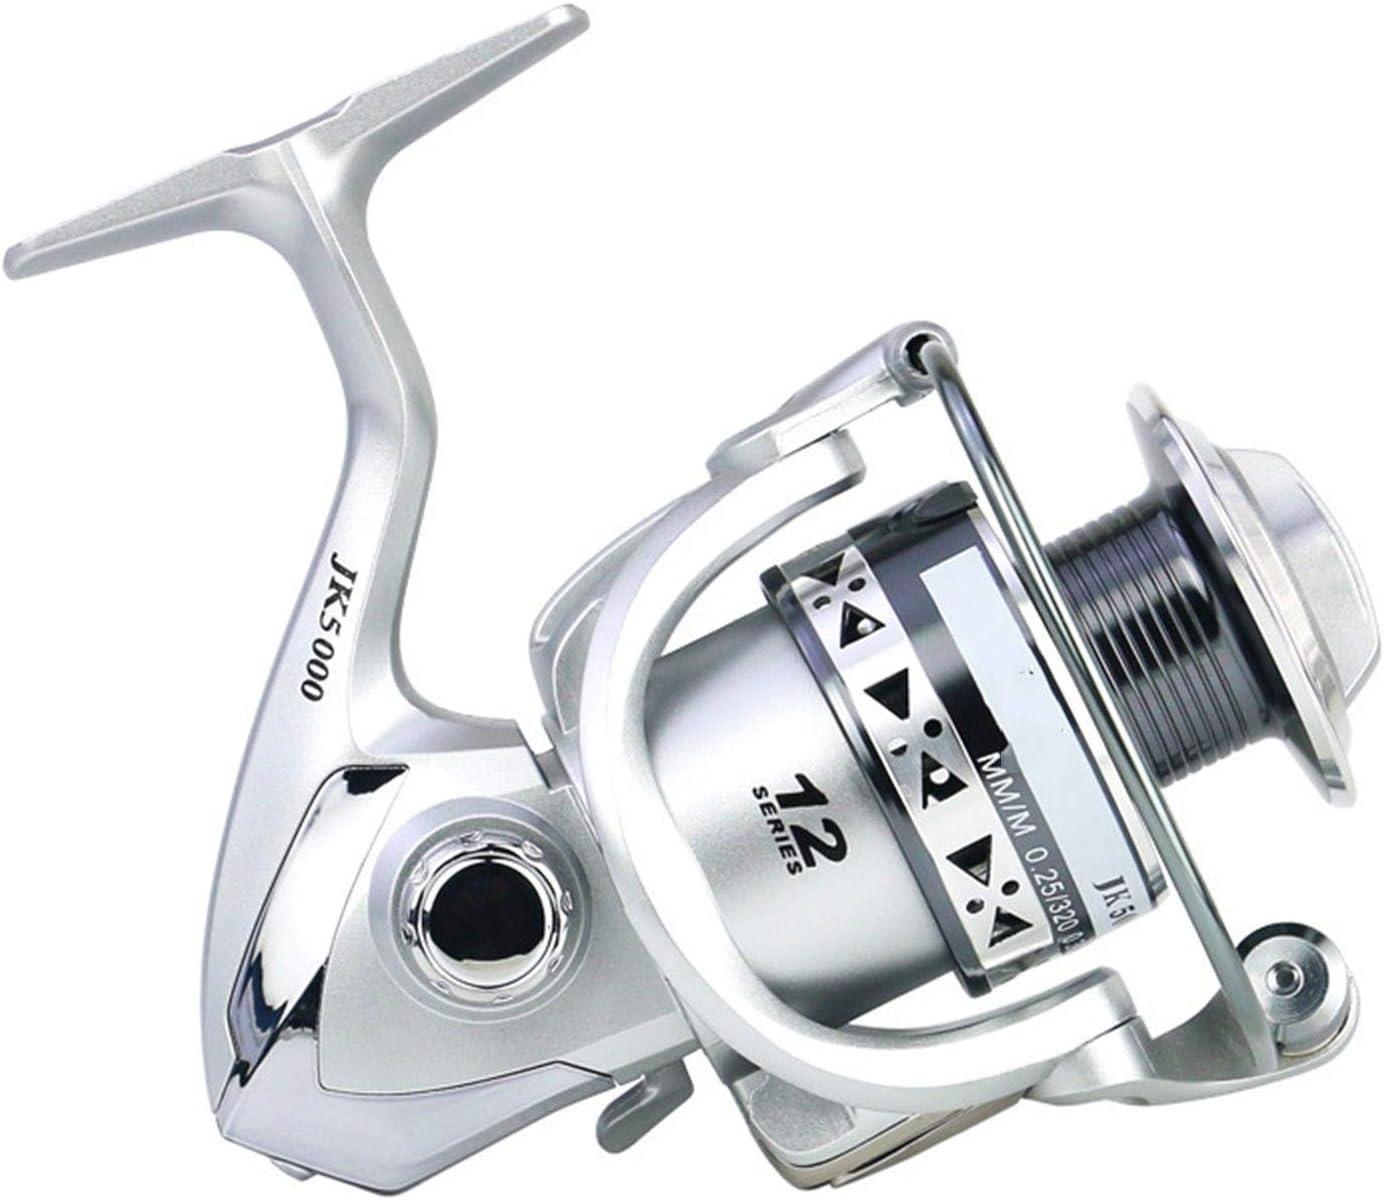 Max 83% OFF L-SHISM Fishing Reels Reel JK1000-7000 BB Outlet ☆ Free Shipping Meta Series 12